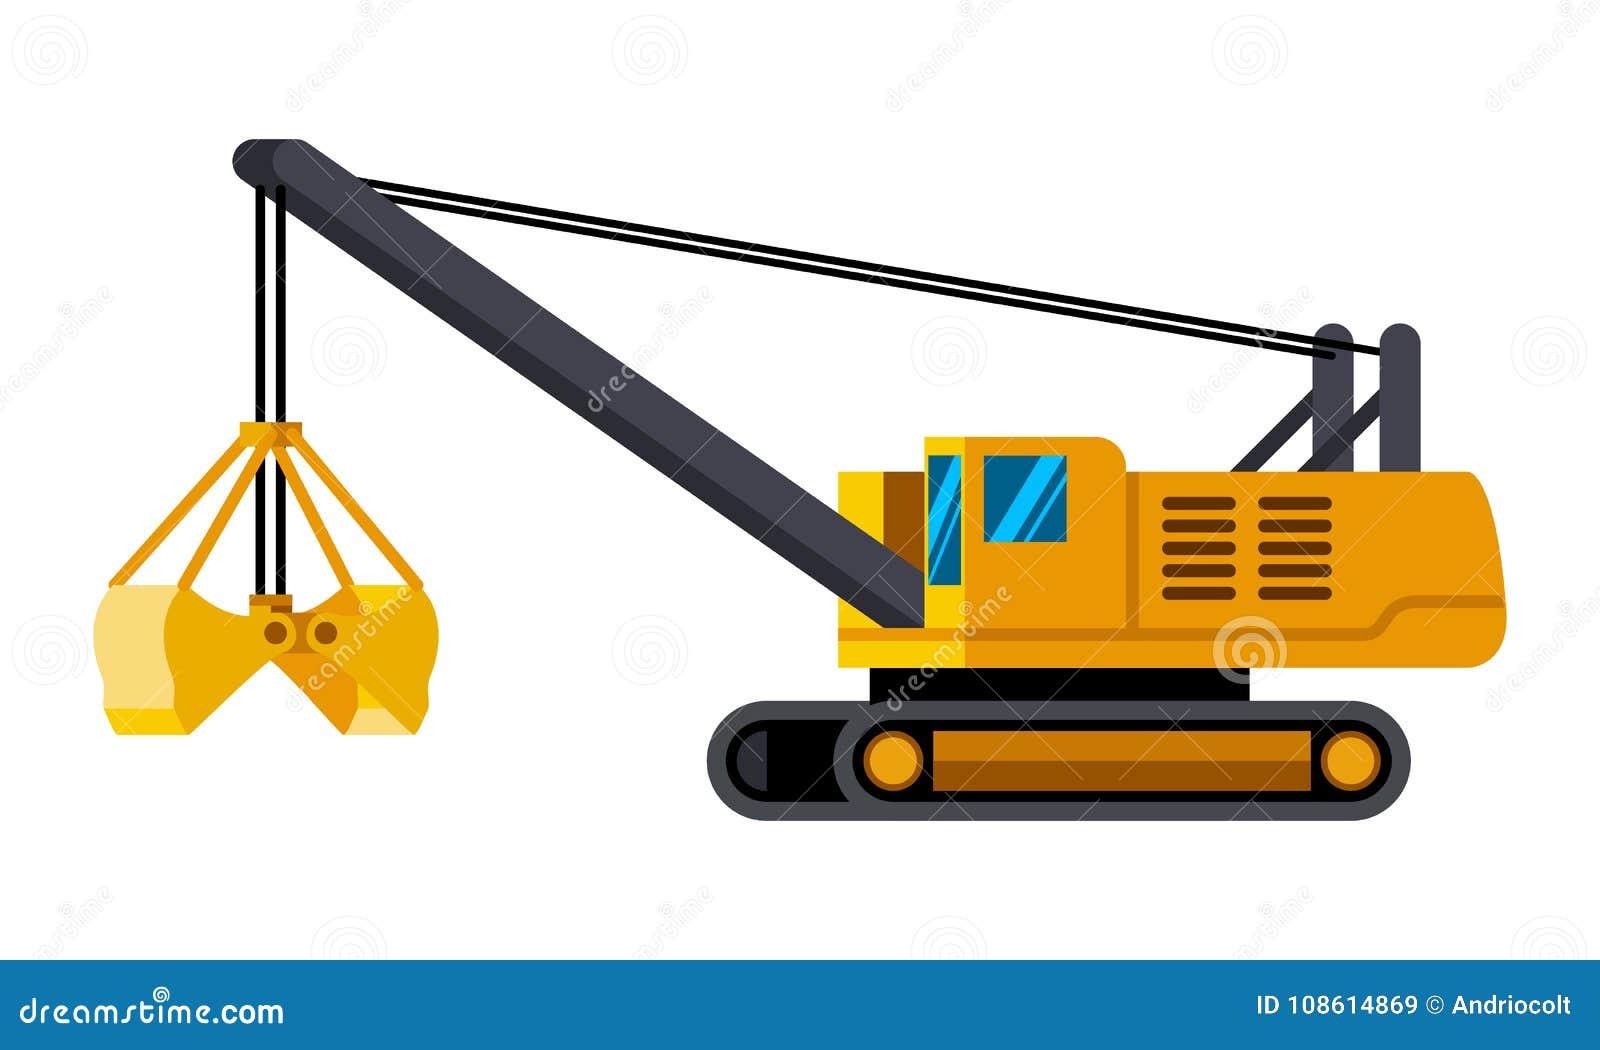 Cable Clamshell Bucket Excavator Minimalistic Icon Stock